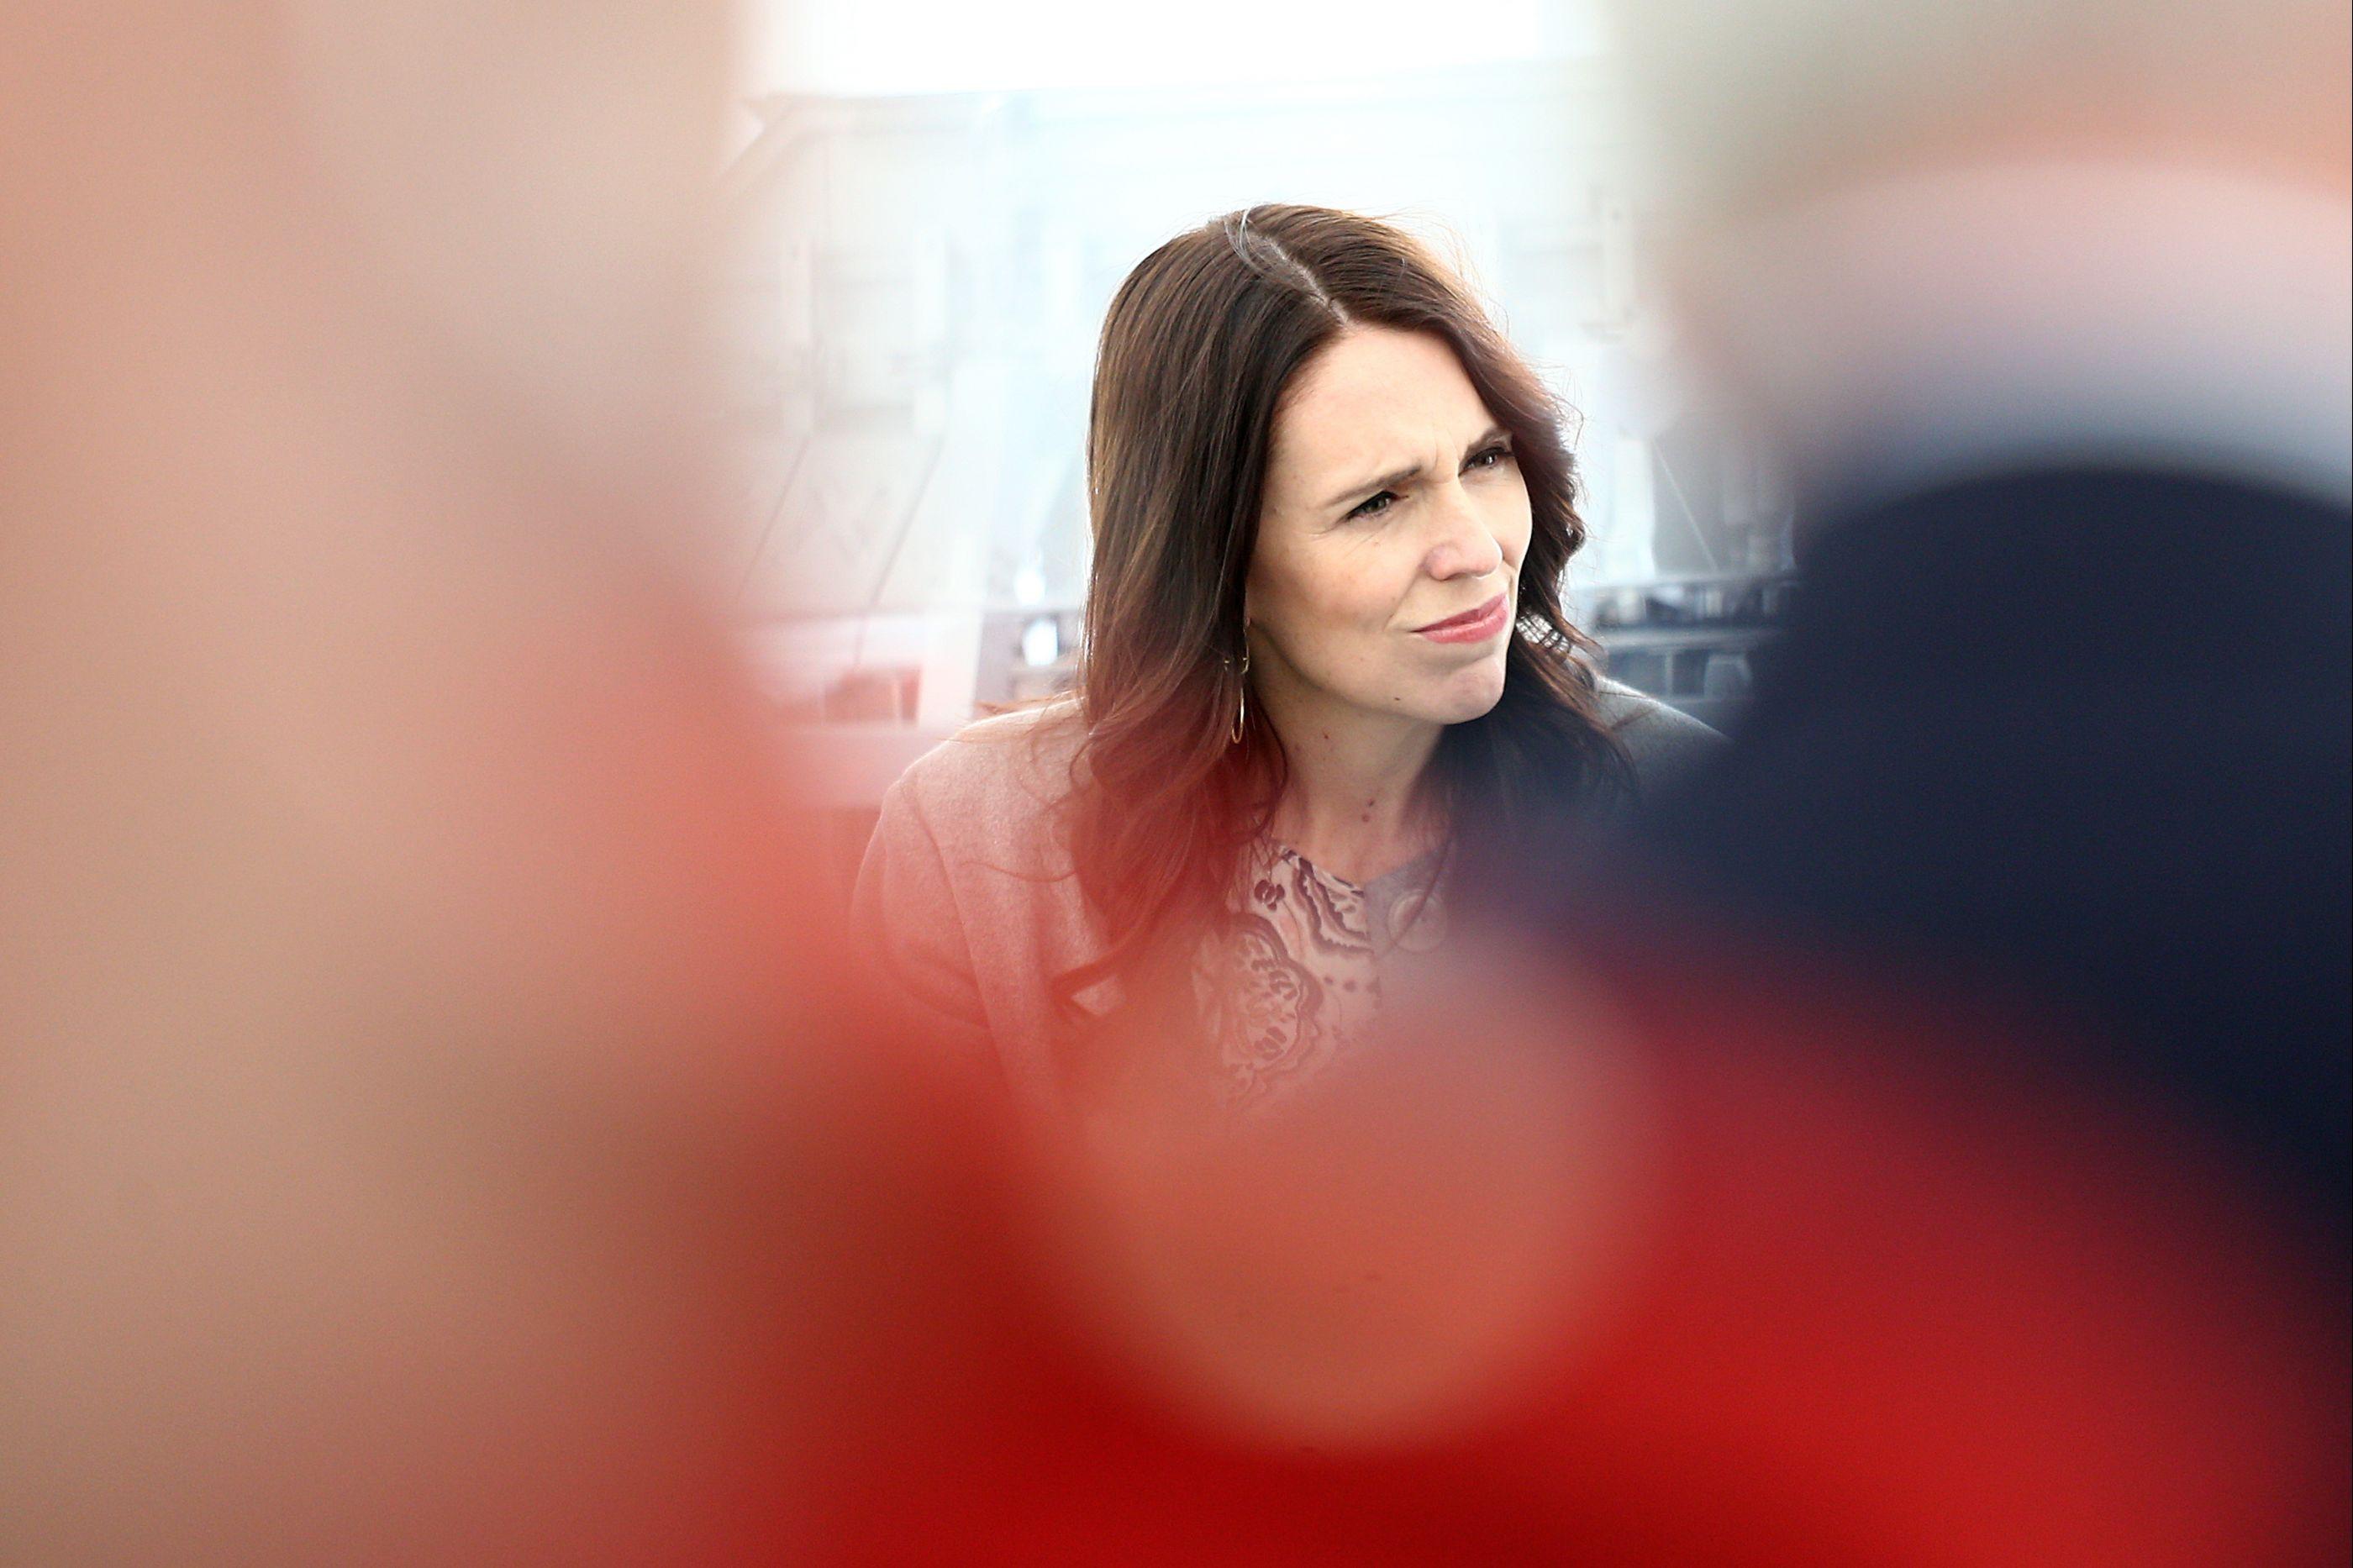 Primeira-ministra emociona-se ao pedir desculpa a pais de jovem morta